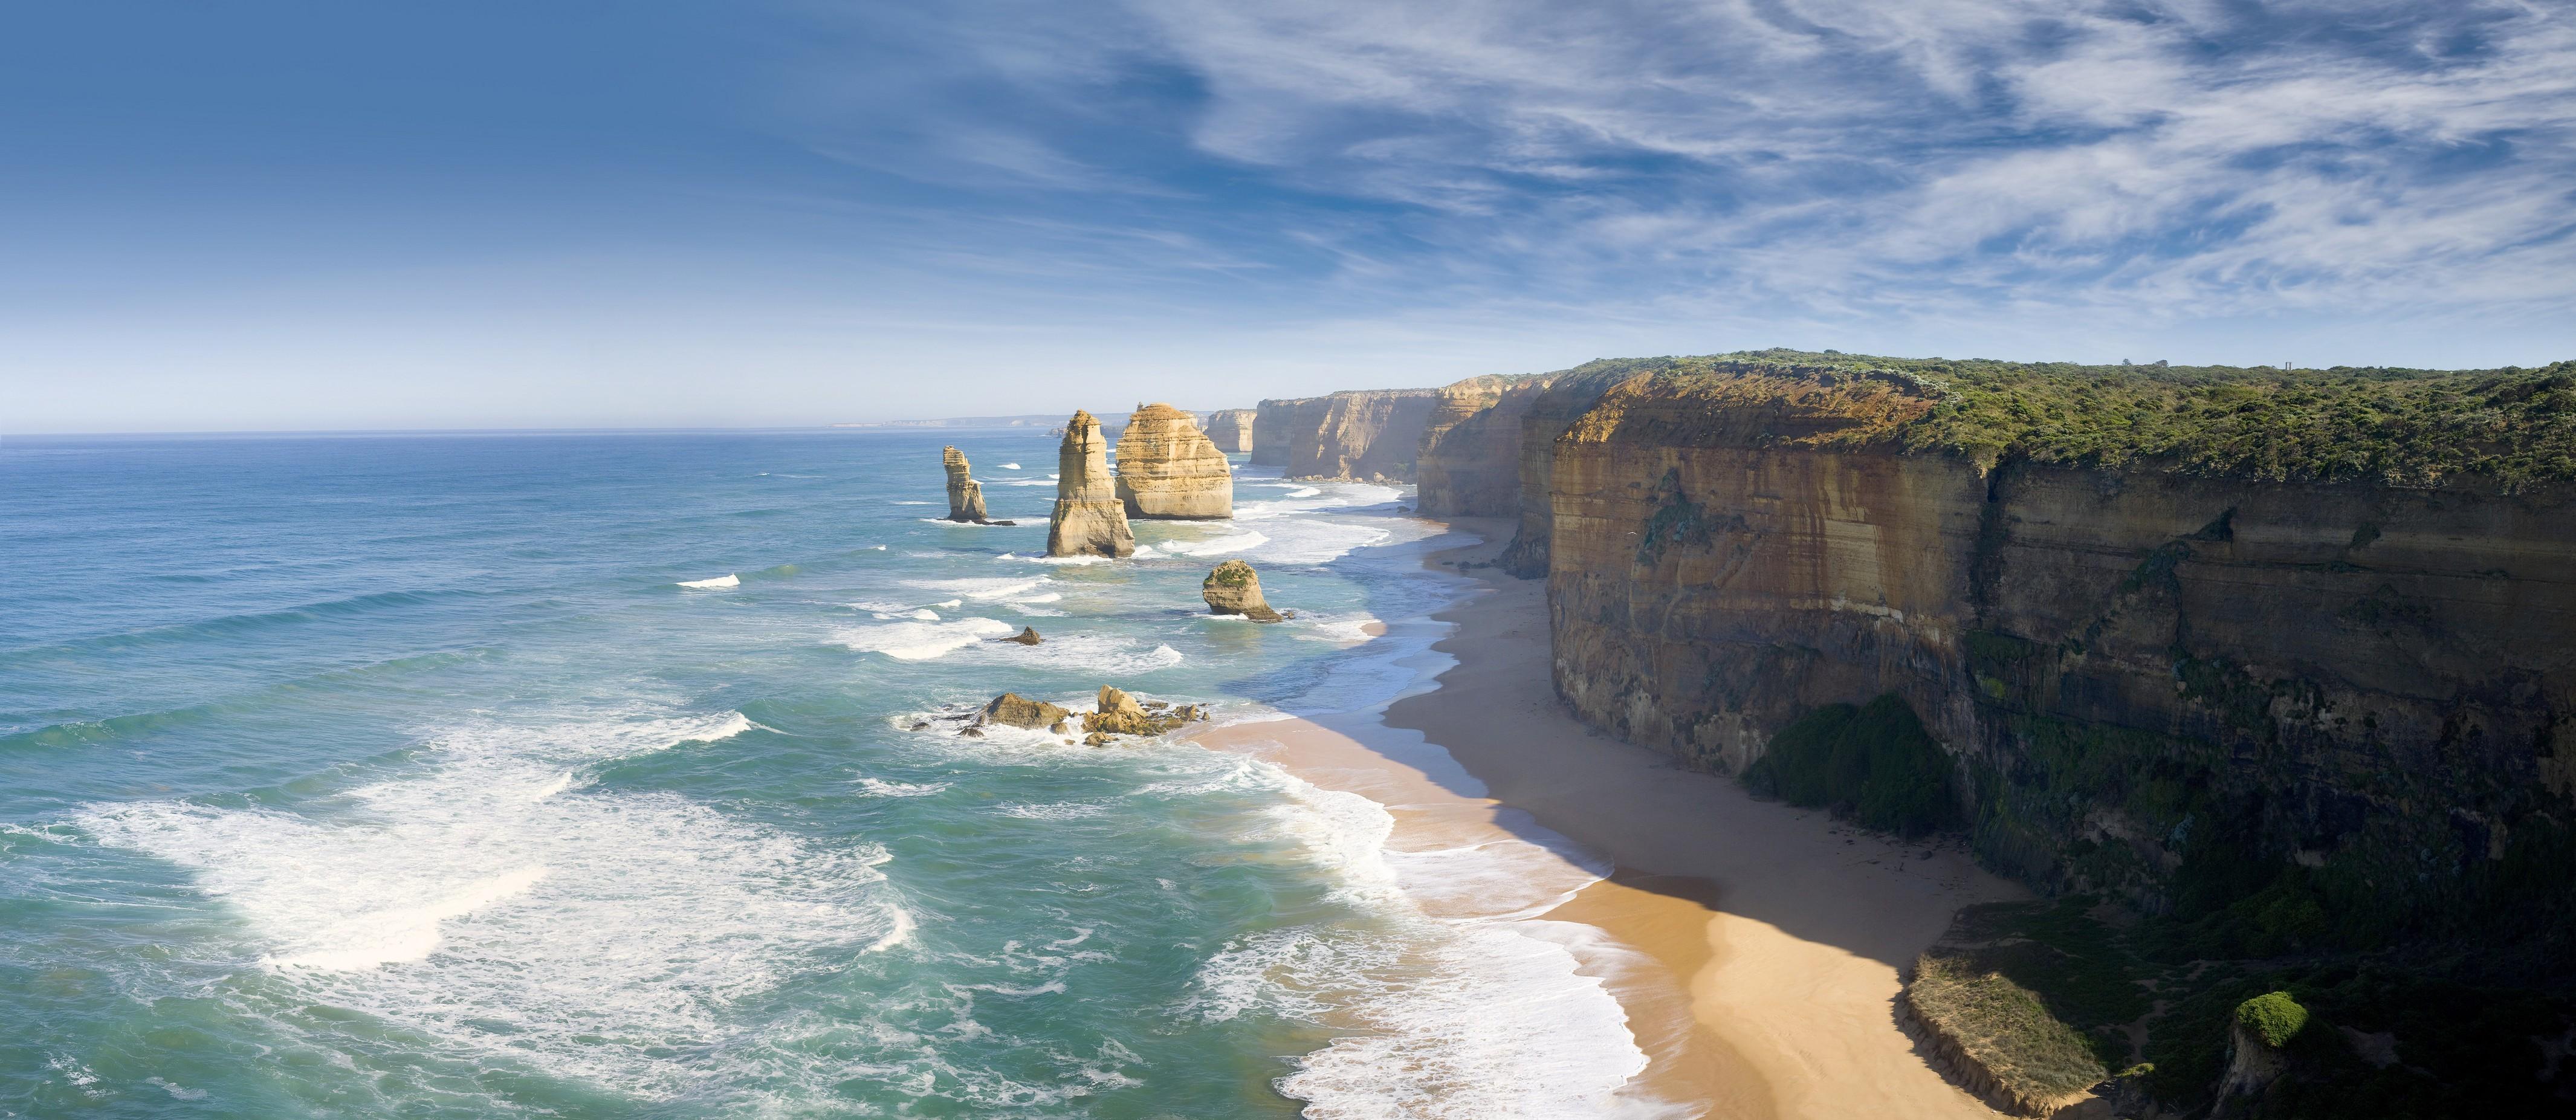 wallpaper melbourne, 4k, hd wallpaper, australia, best beaches in